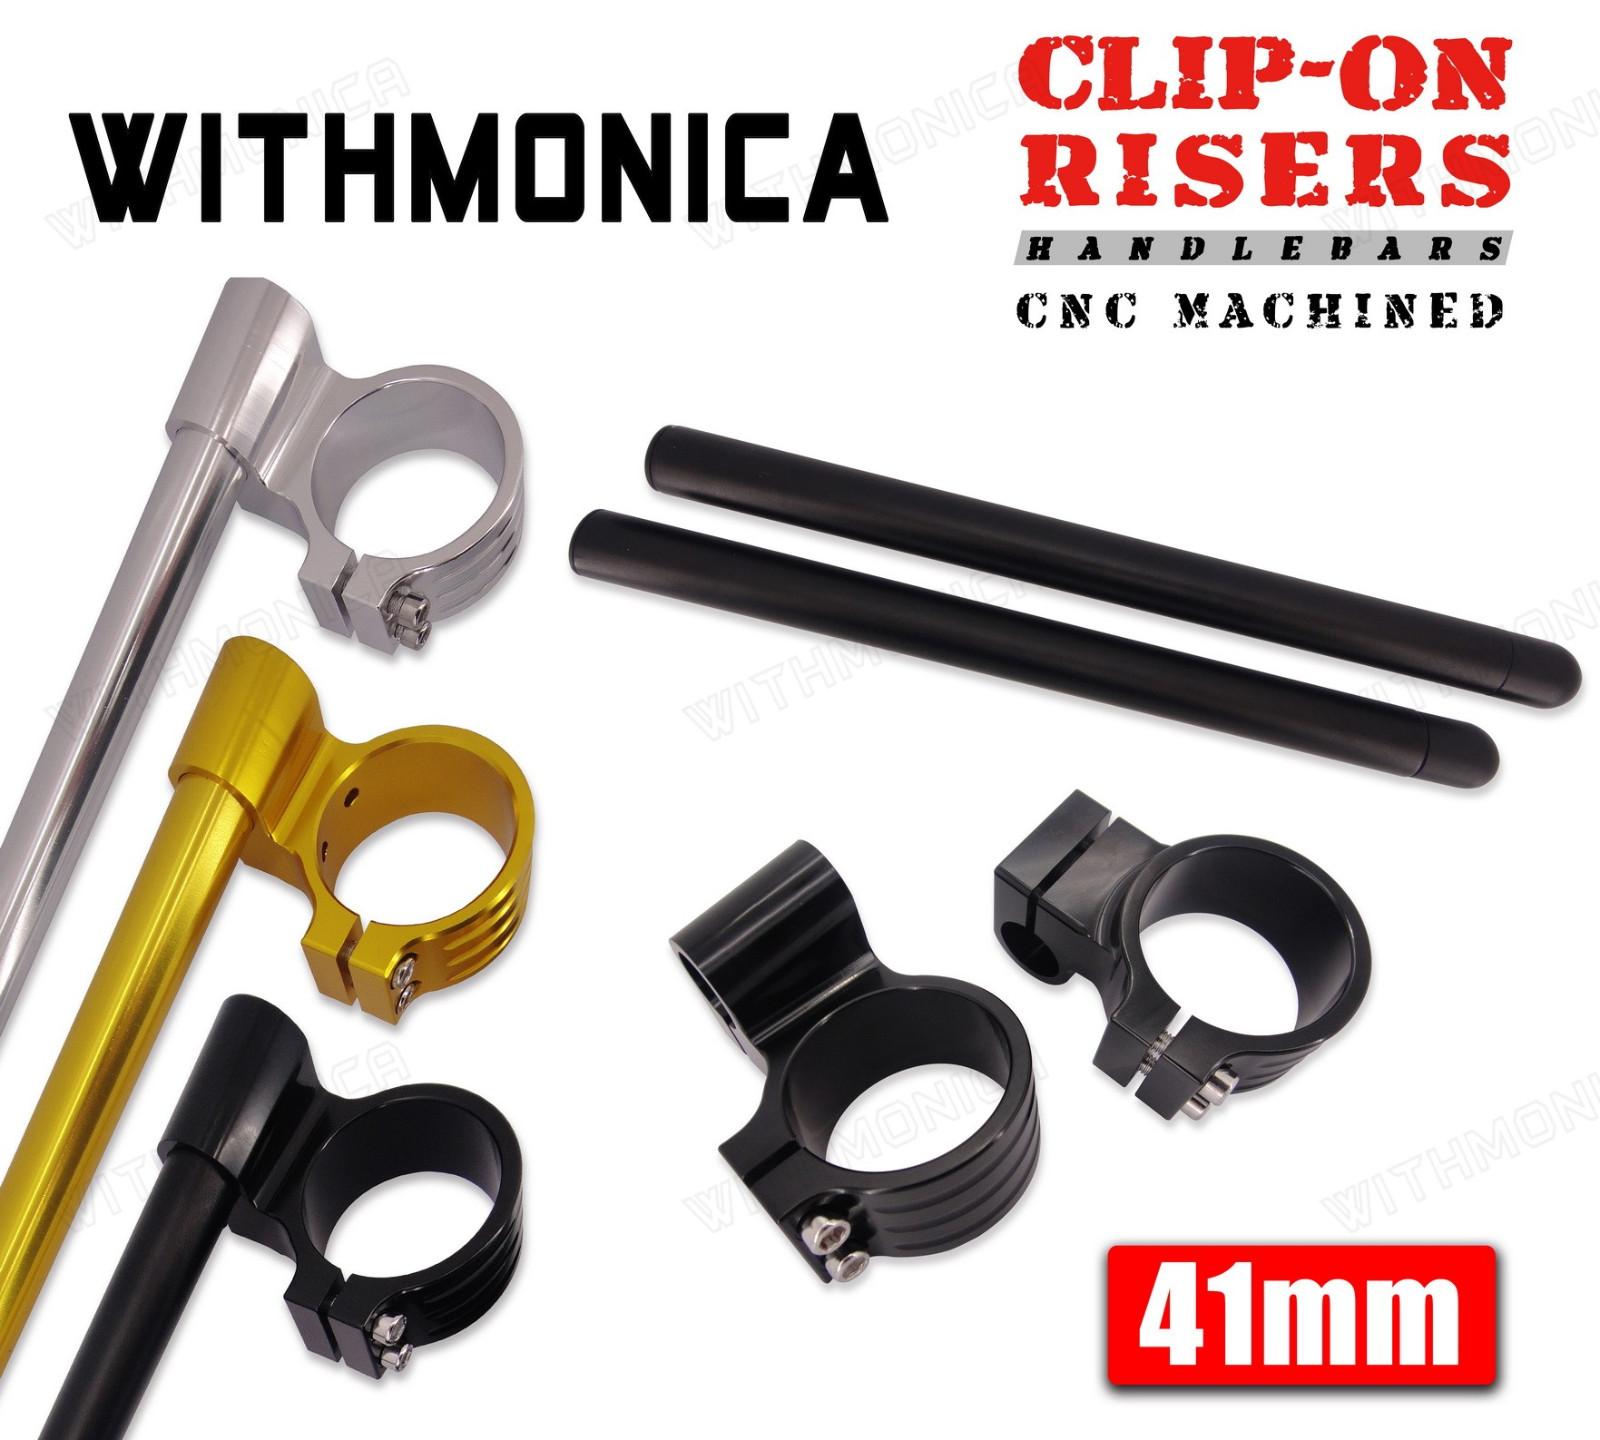 Clipons 41mm Clip-On Handlebars Fit Kawasaki 1991 1992 1993 2000 ZR750